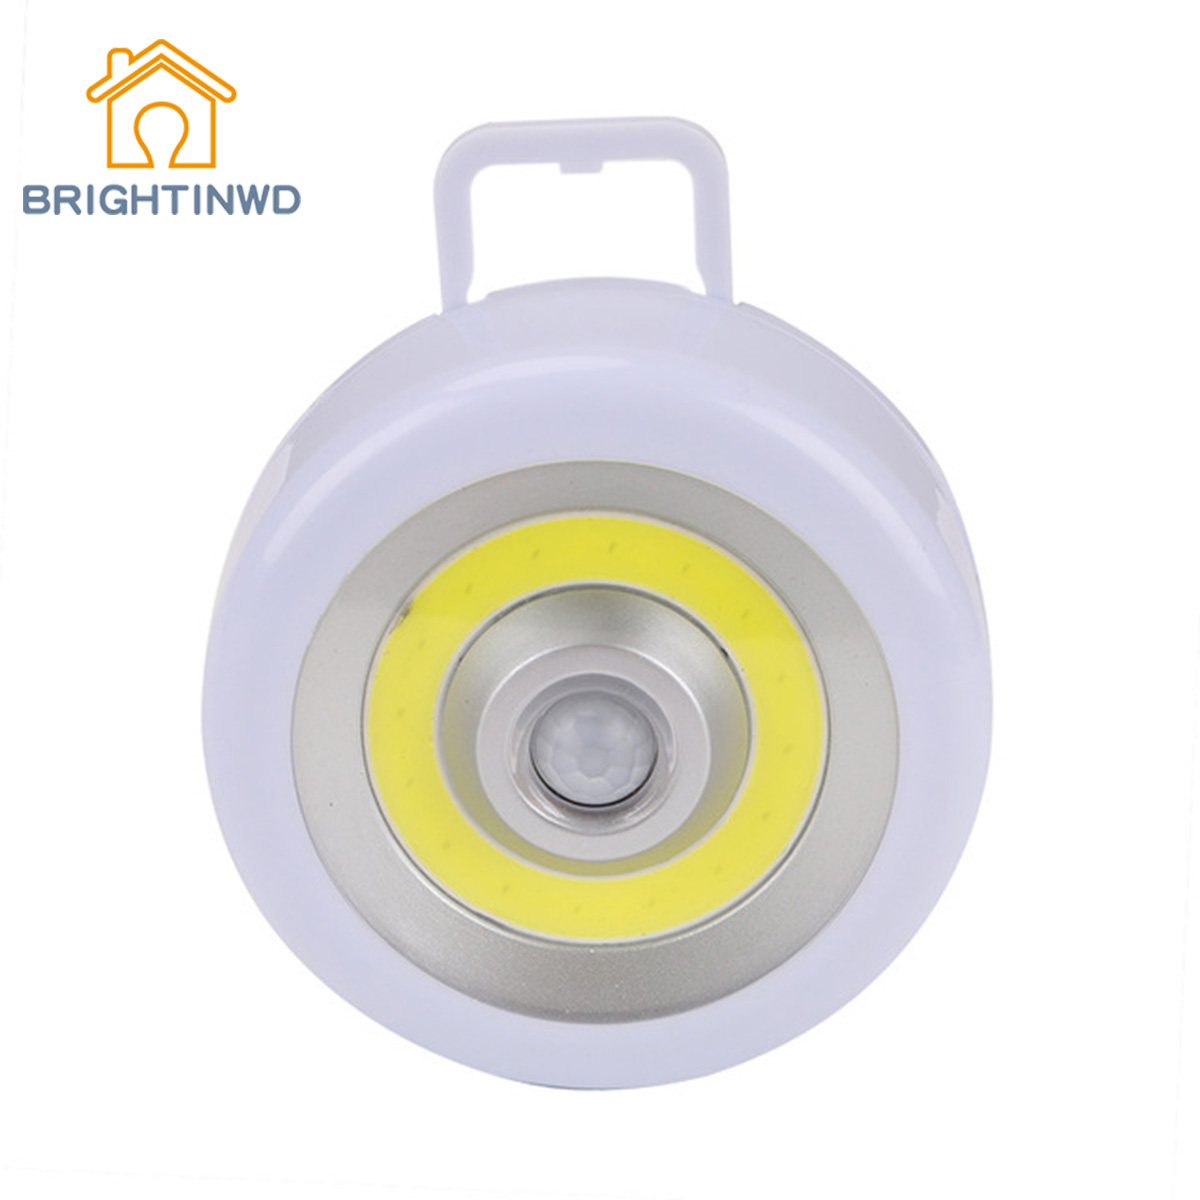 COB LED Light Sensor Night Light for Emergency Lighting LED Portable Light Camping Lamp Batteries Operated Camping Lantern